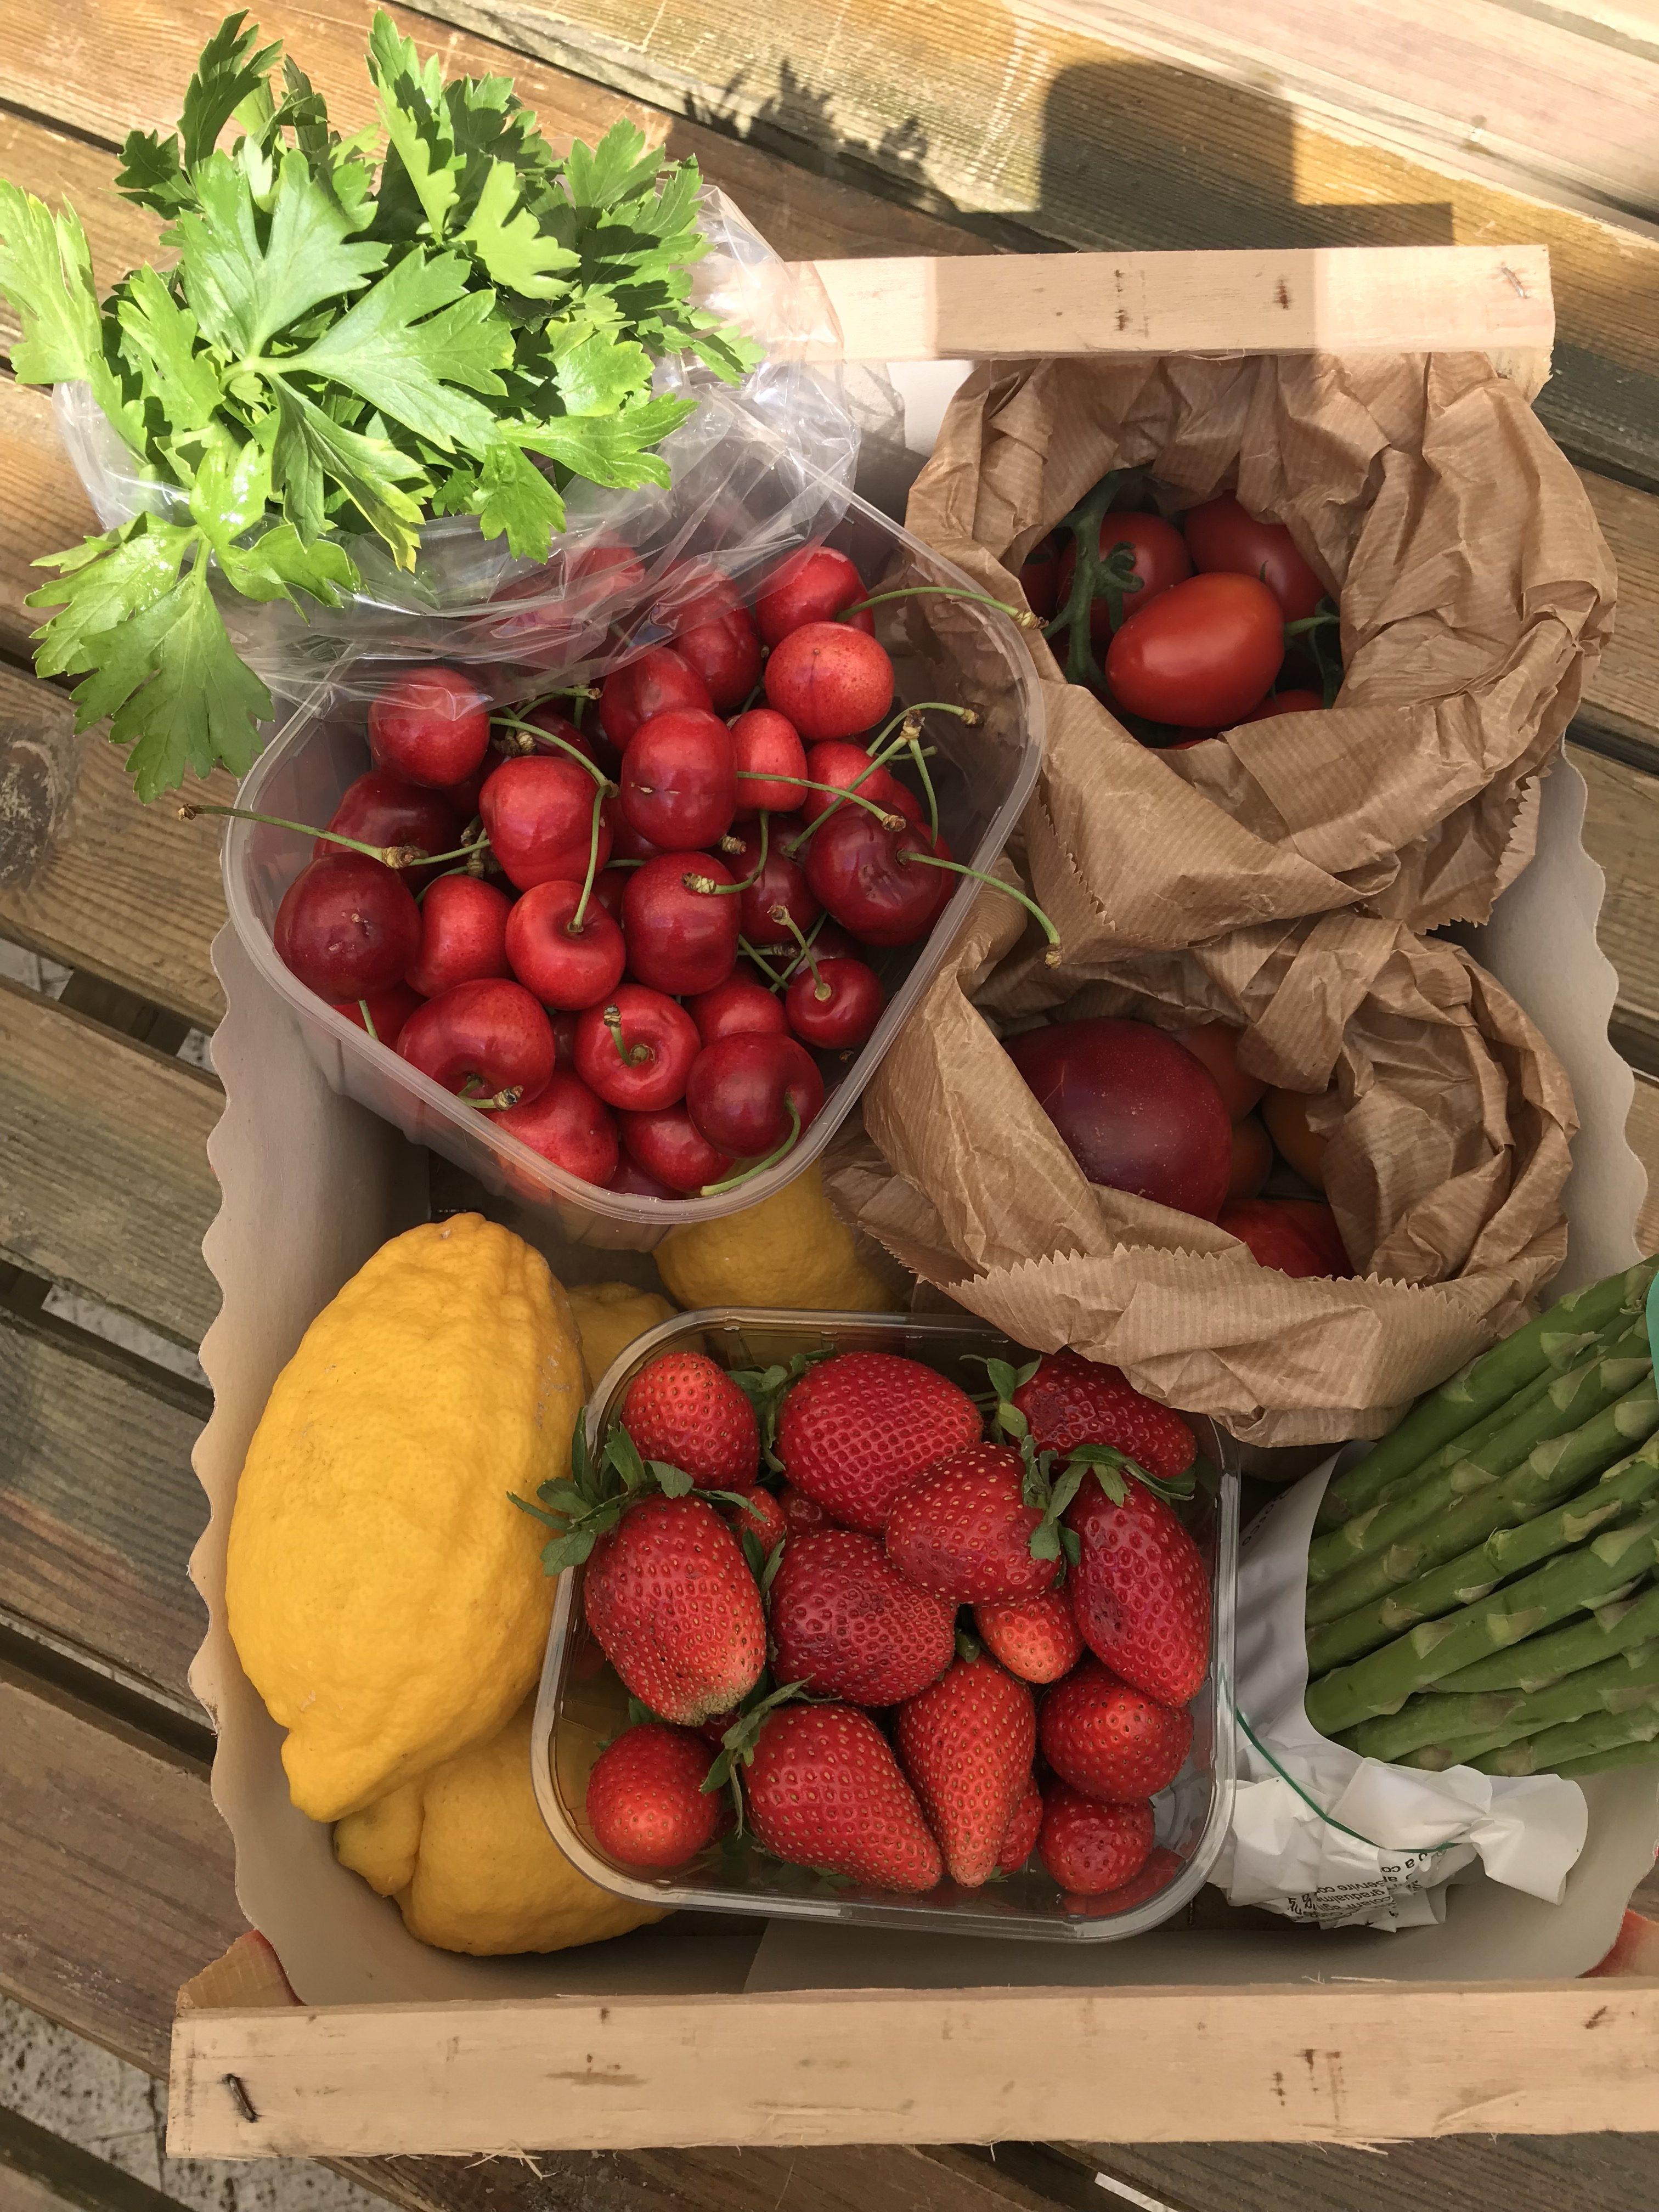 Cassetta frutta e verdura